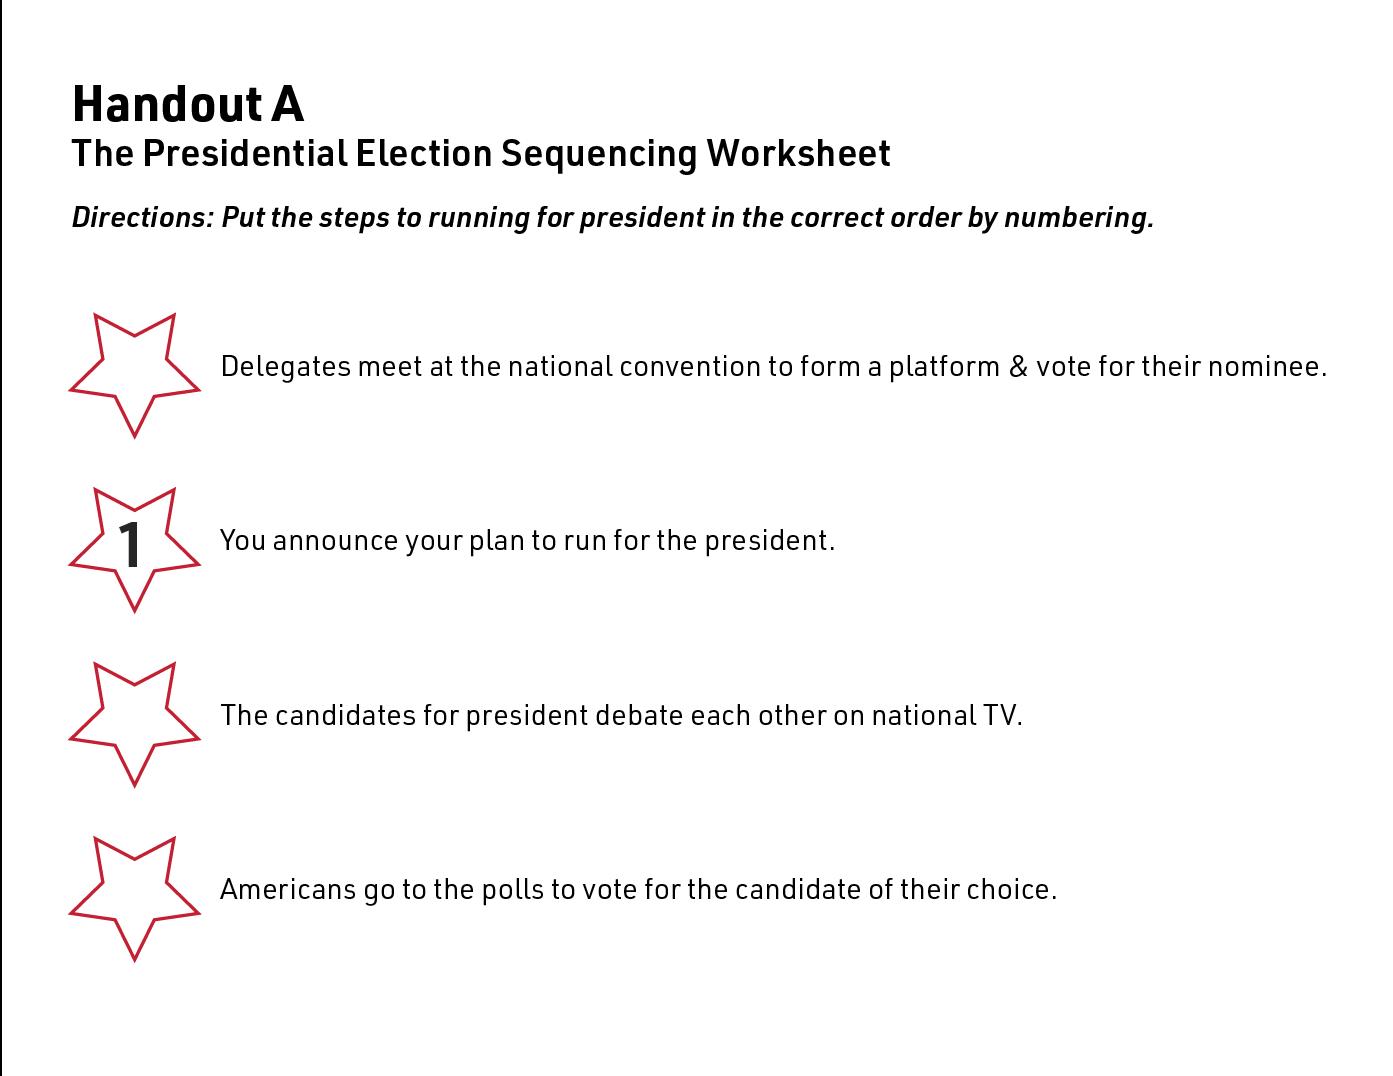 kid's guide to running for president